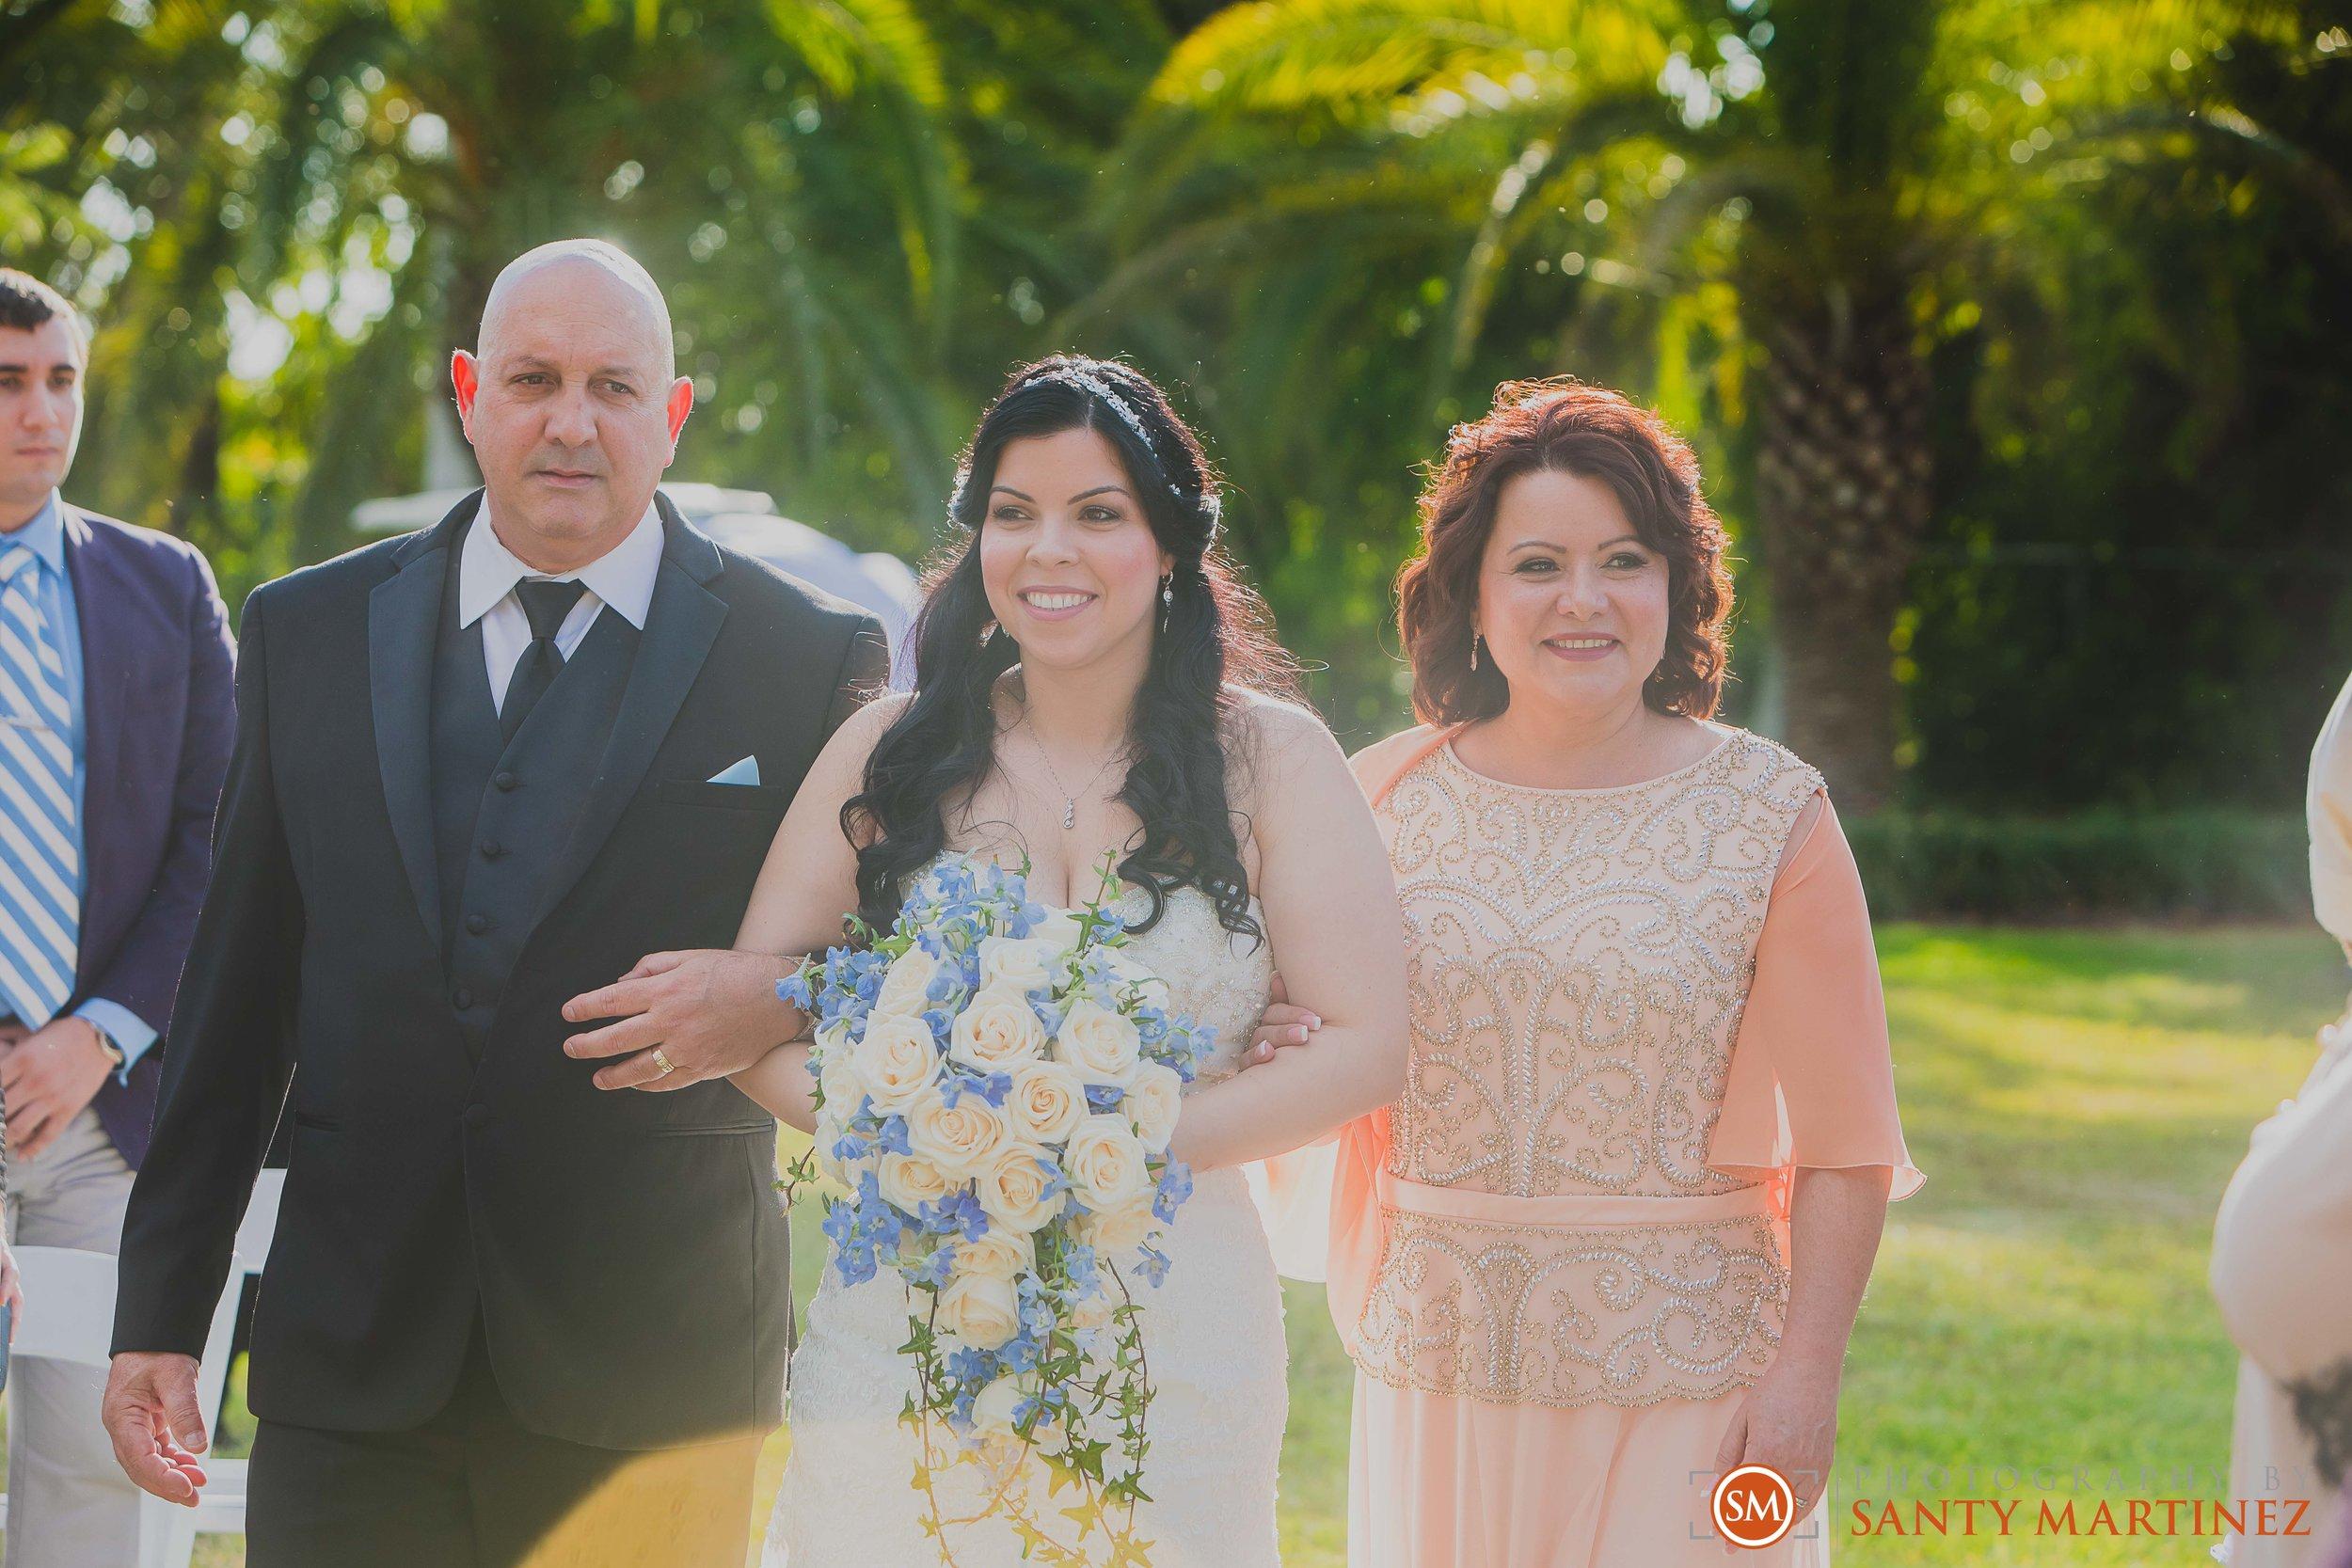 Wedding - Whimsical key West House - Photography by Santy Martinez-16.jpg